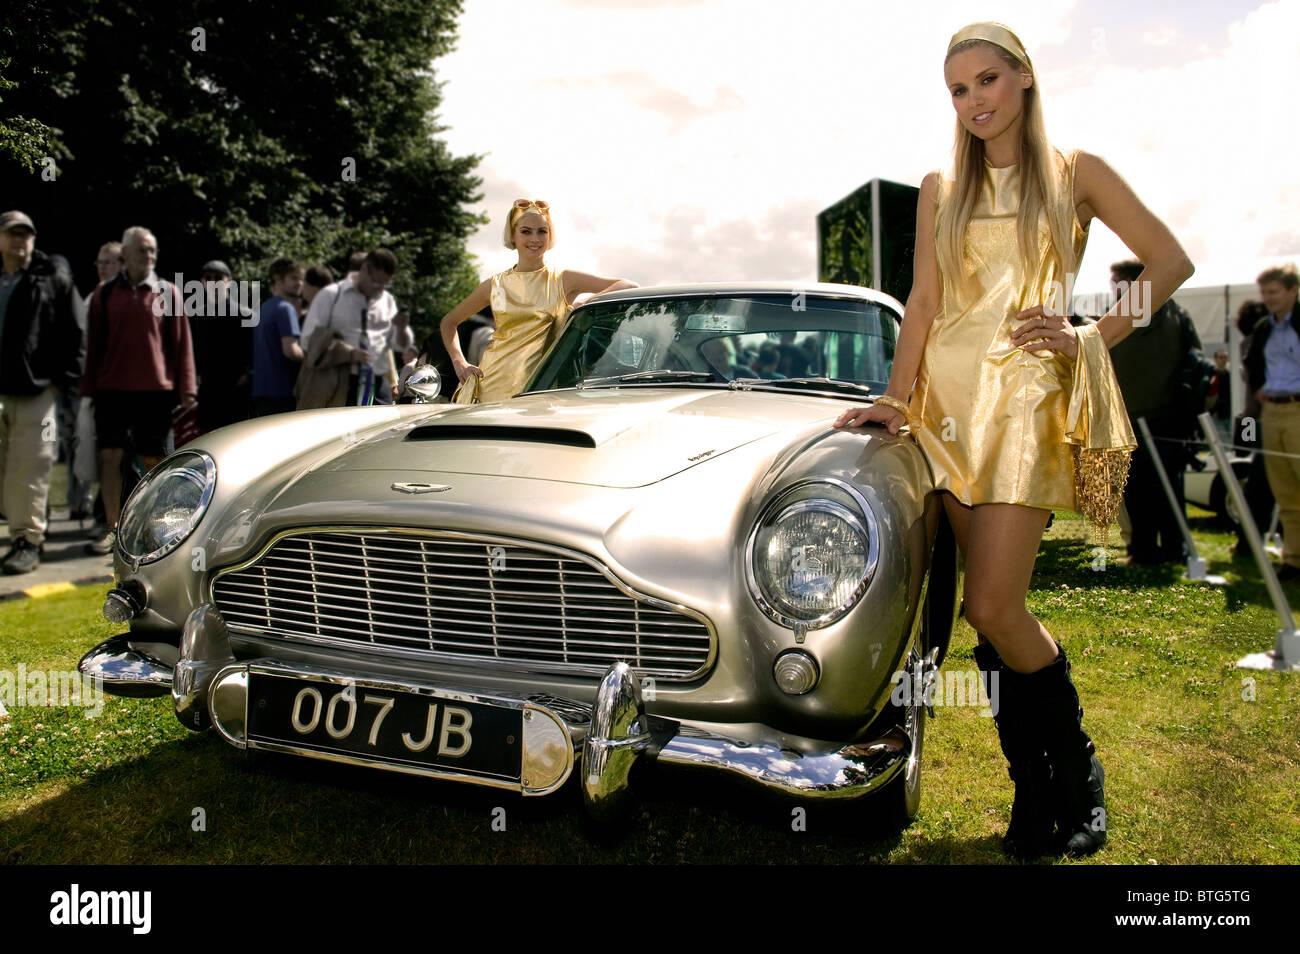 james bond 007 aston martin db5 stockfoto bild 32317952. Black Bedroom Furniture Sets. Home Design Ideas